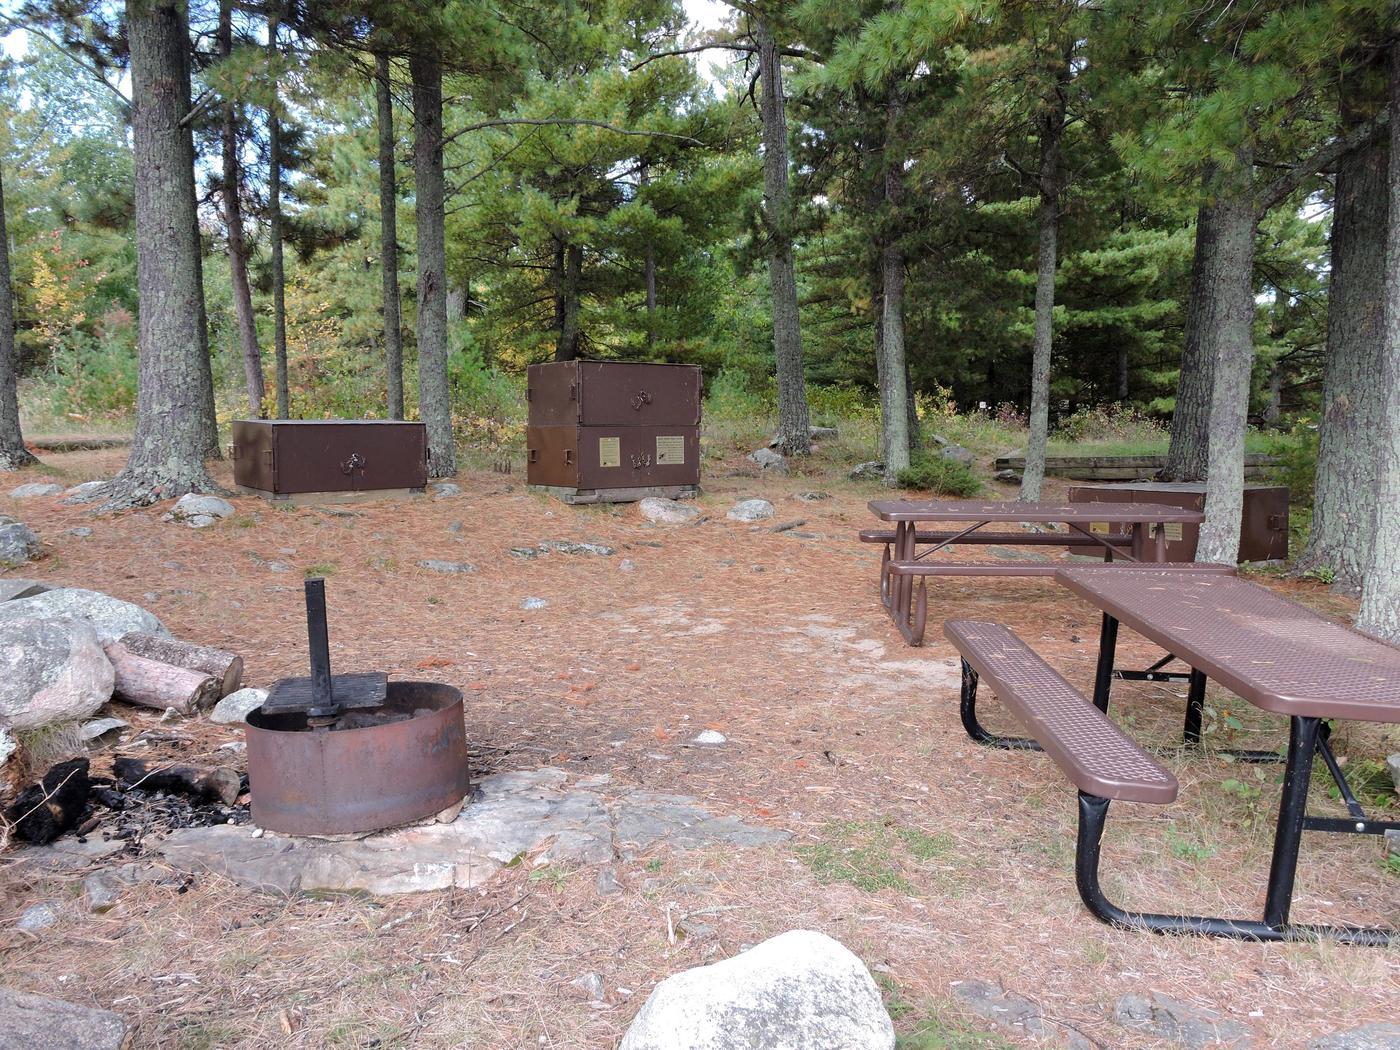 R65 - Reuter CreekView of campsite